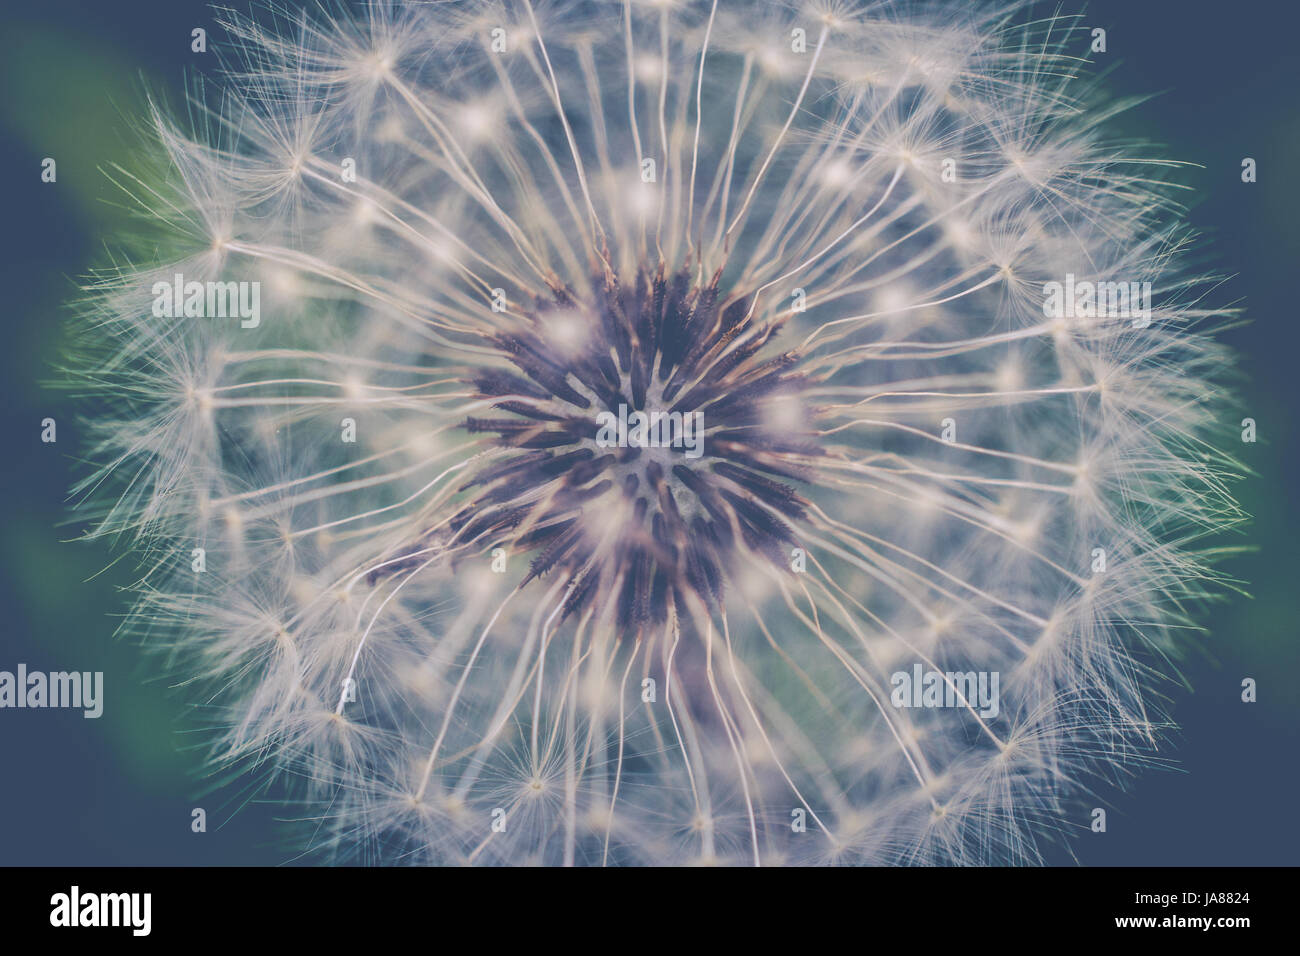 Dandelion Capitulum Close Up - Stock Image